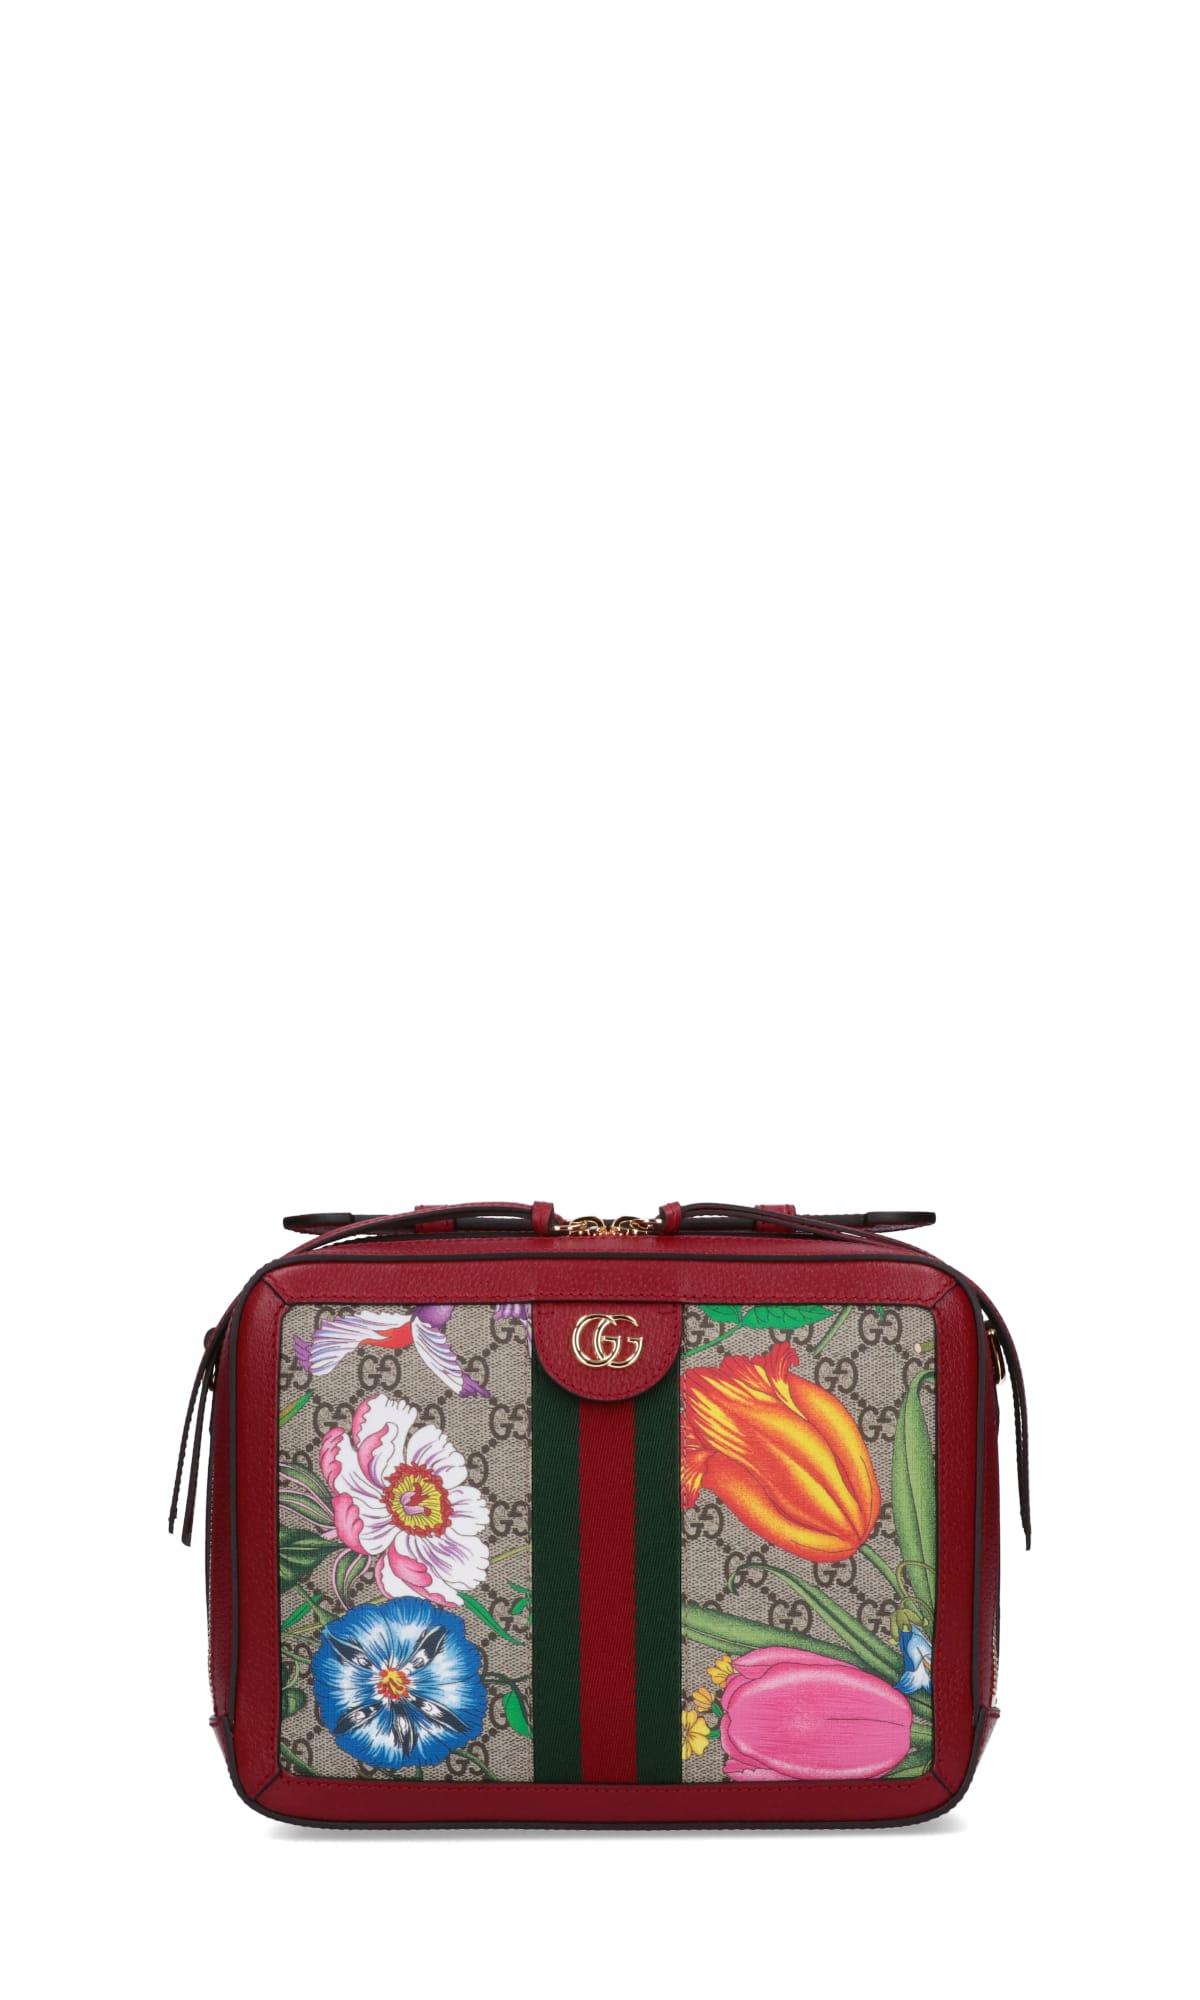 Gucci Ophidia Cube Shoulder-bag